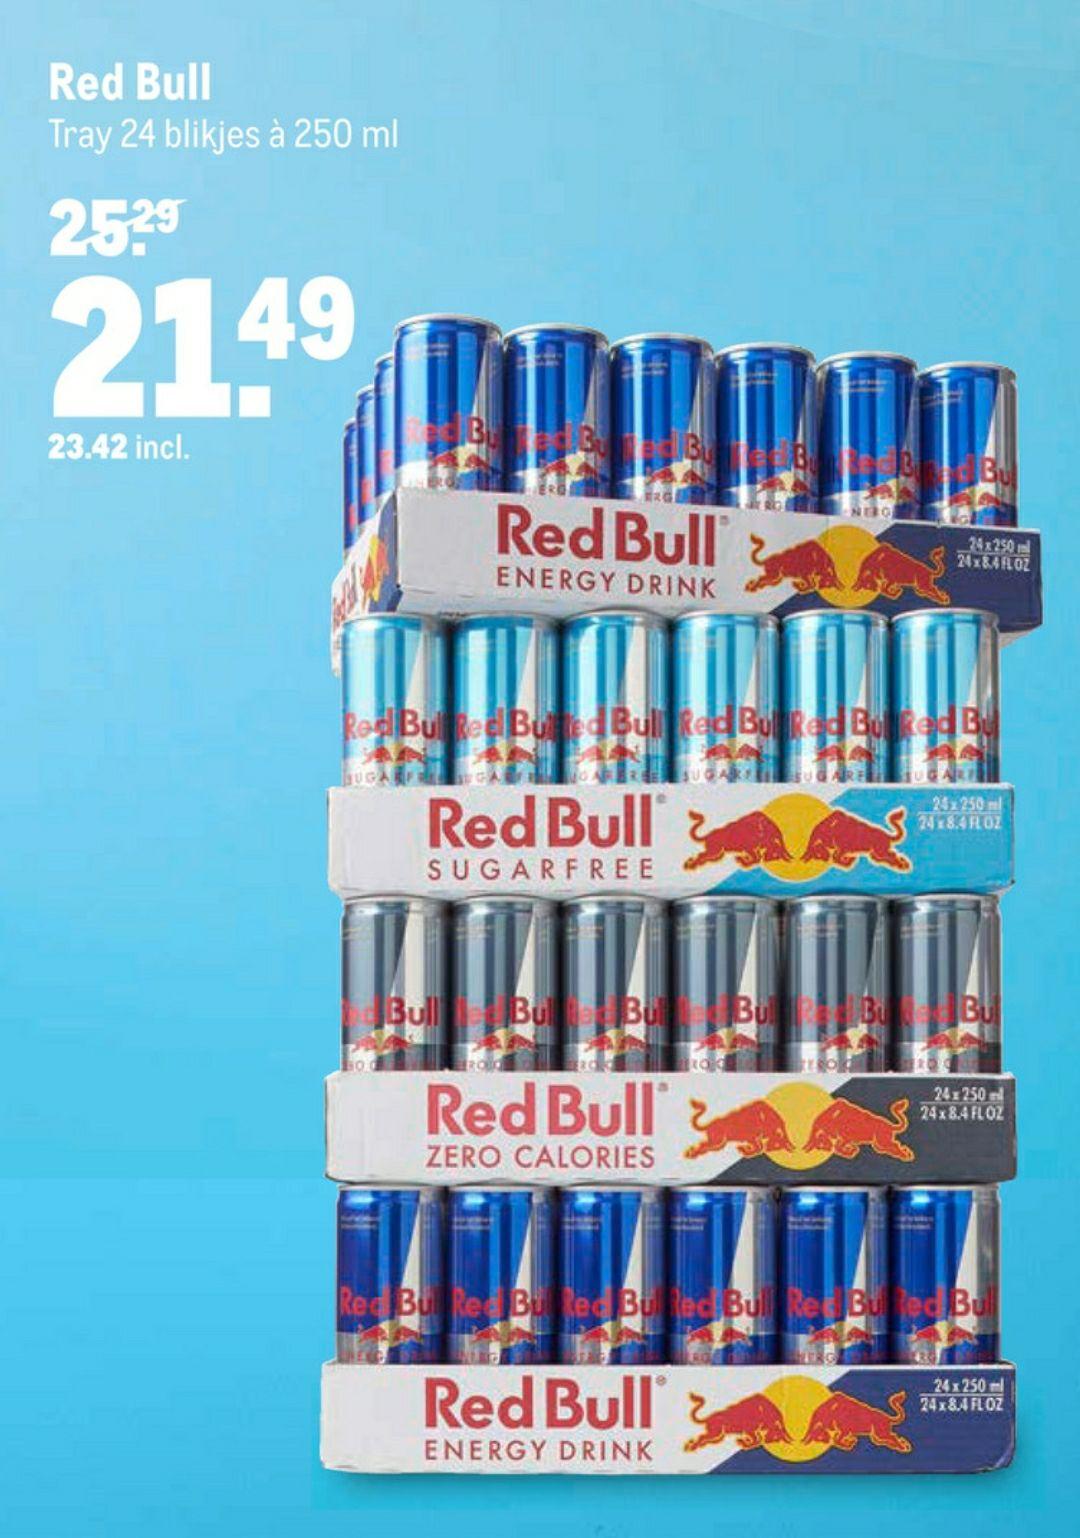 24 red bull blikjes voor €23,42 bij Makro